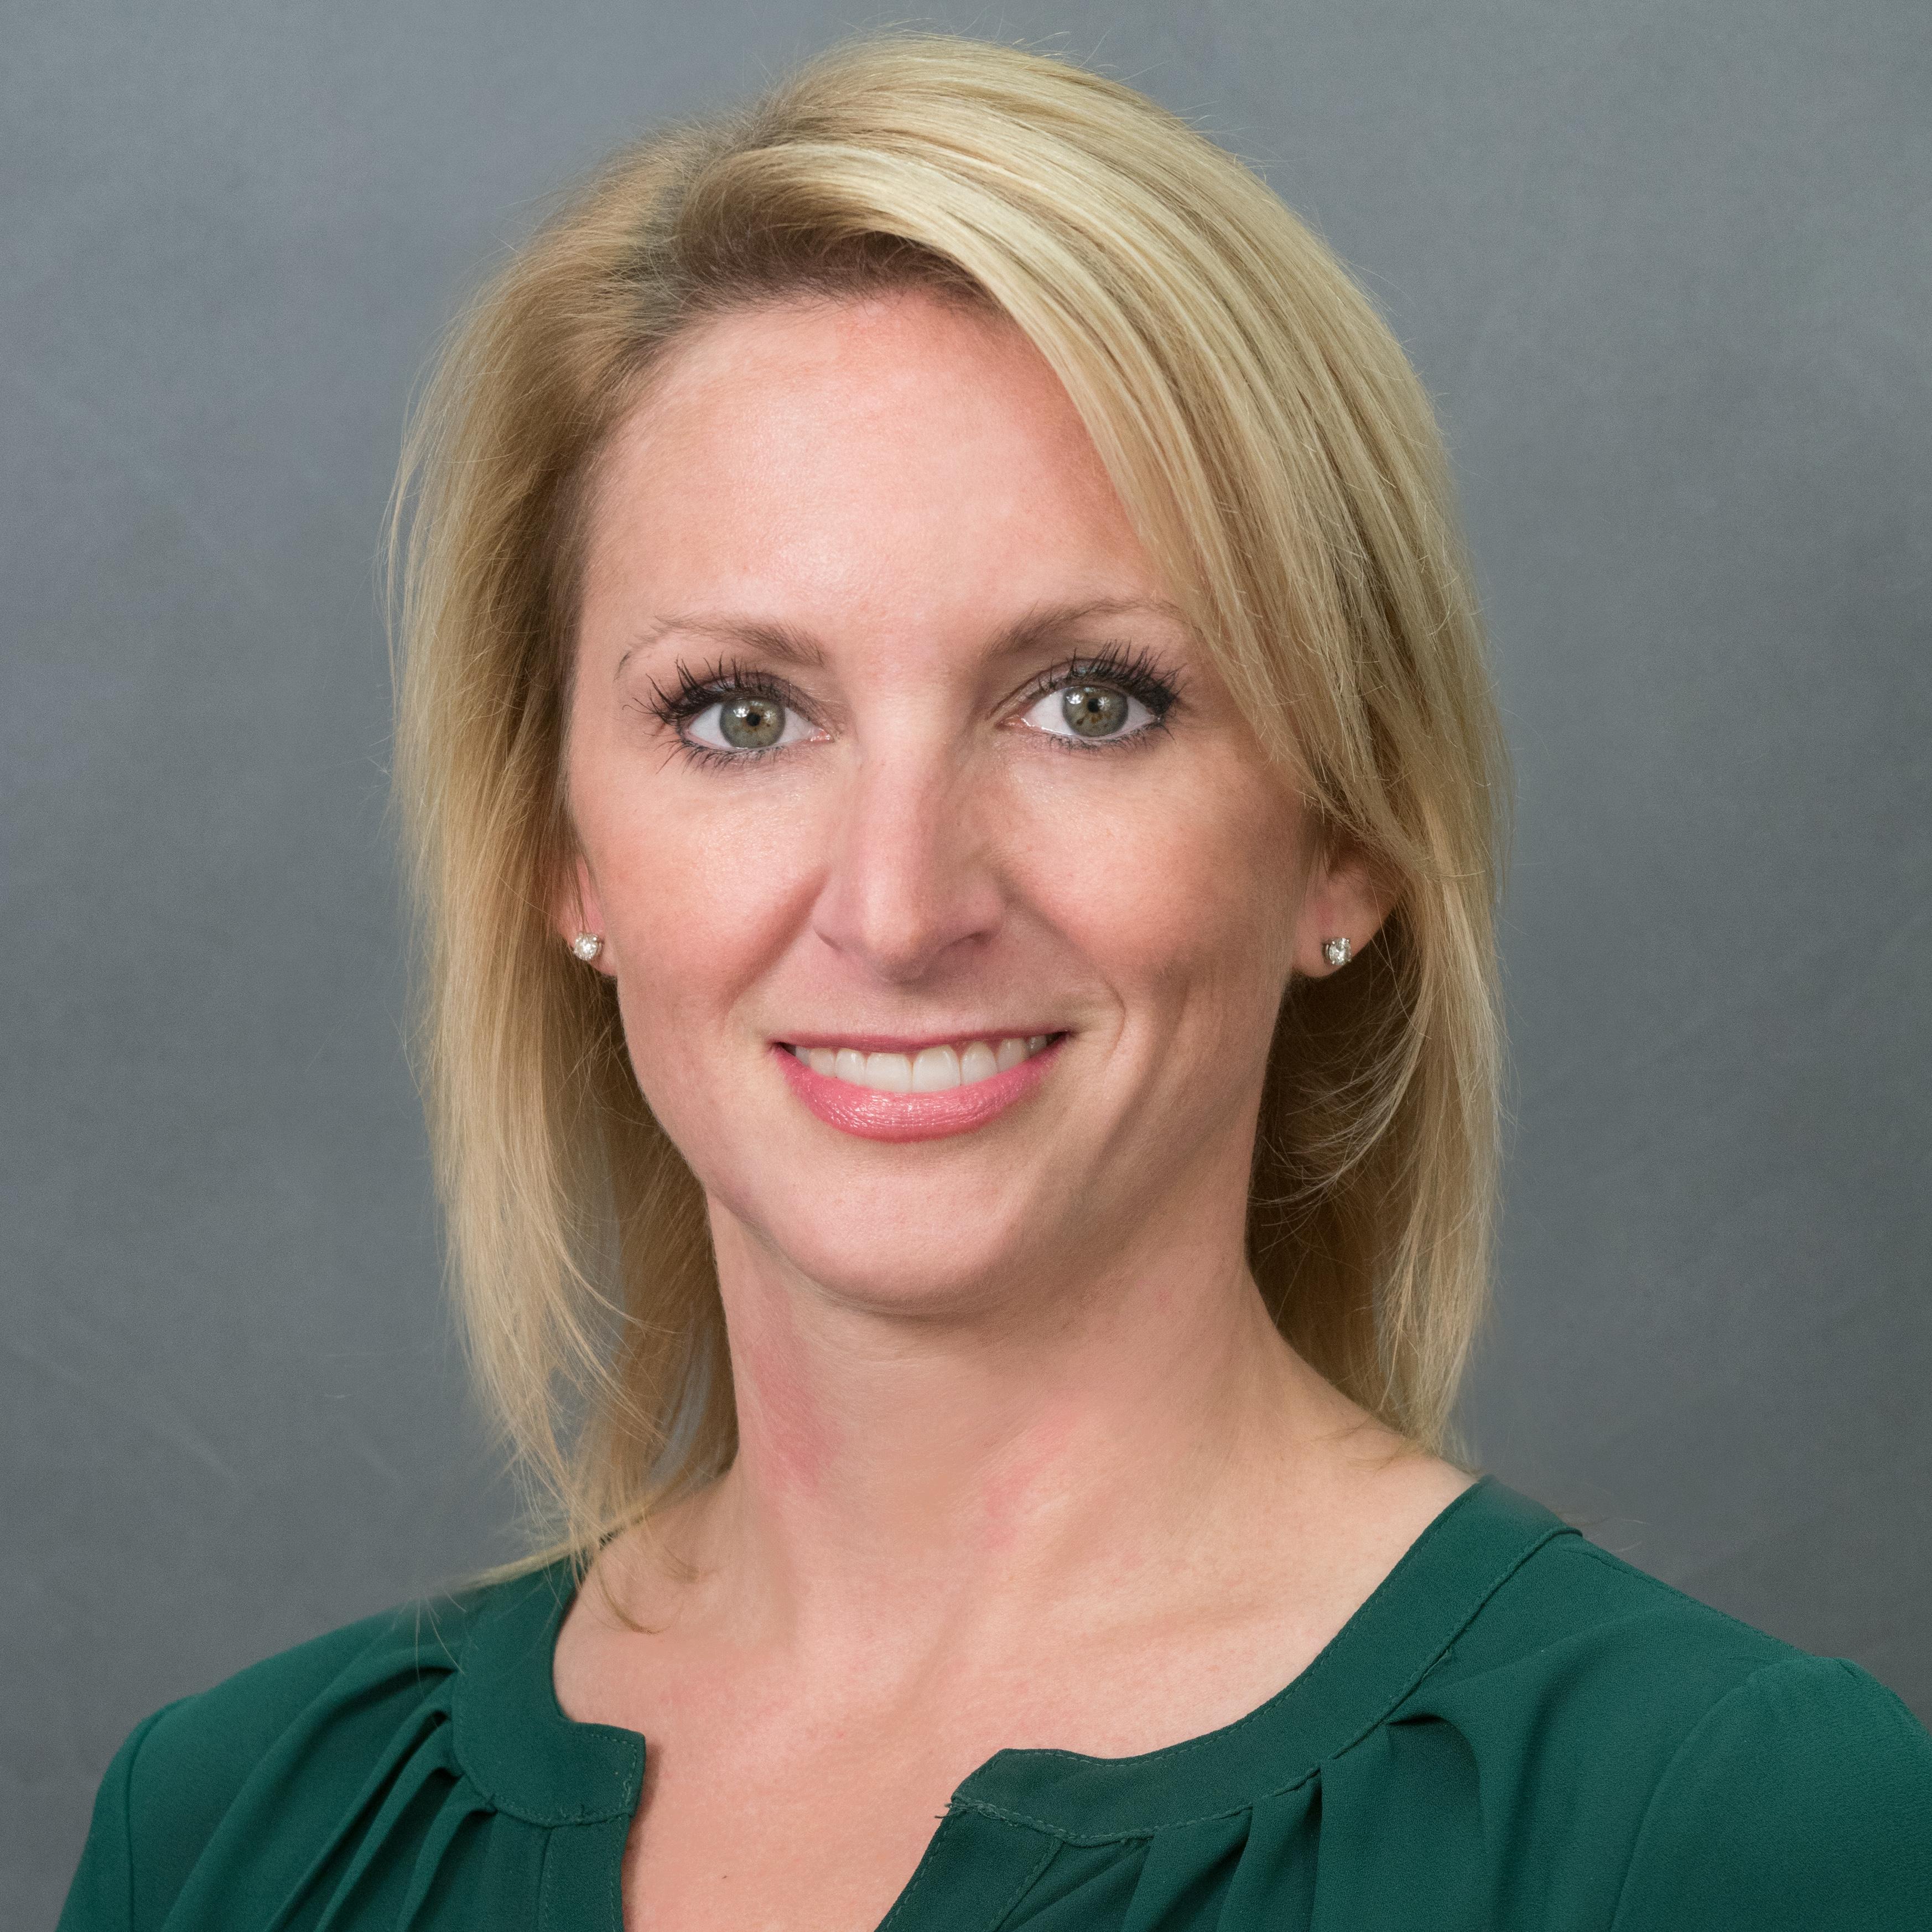 Tara Conley, MSN, RN, NP-C